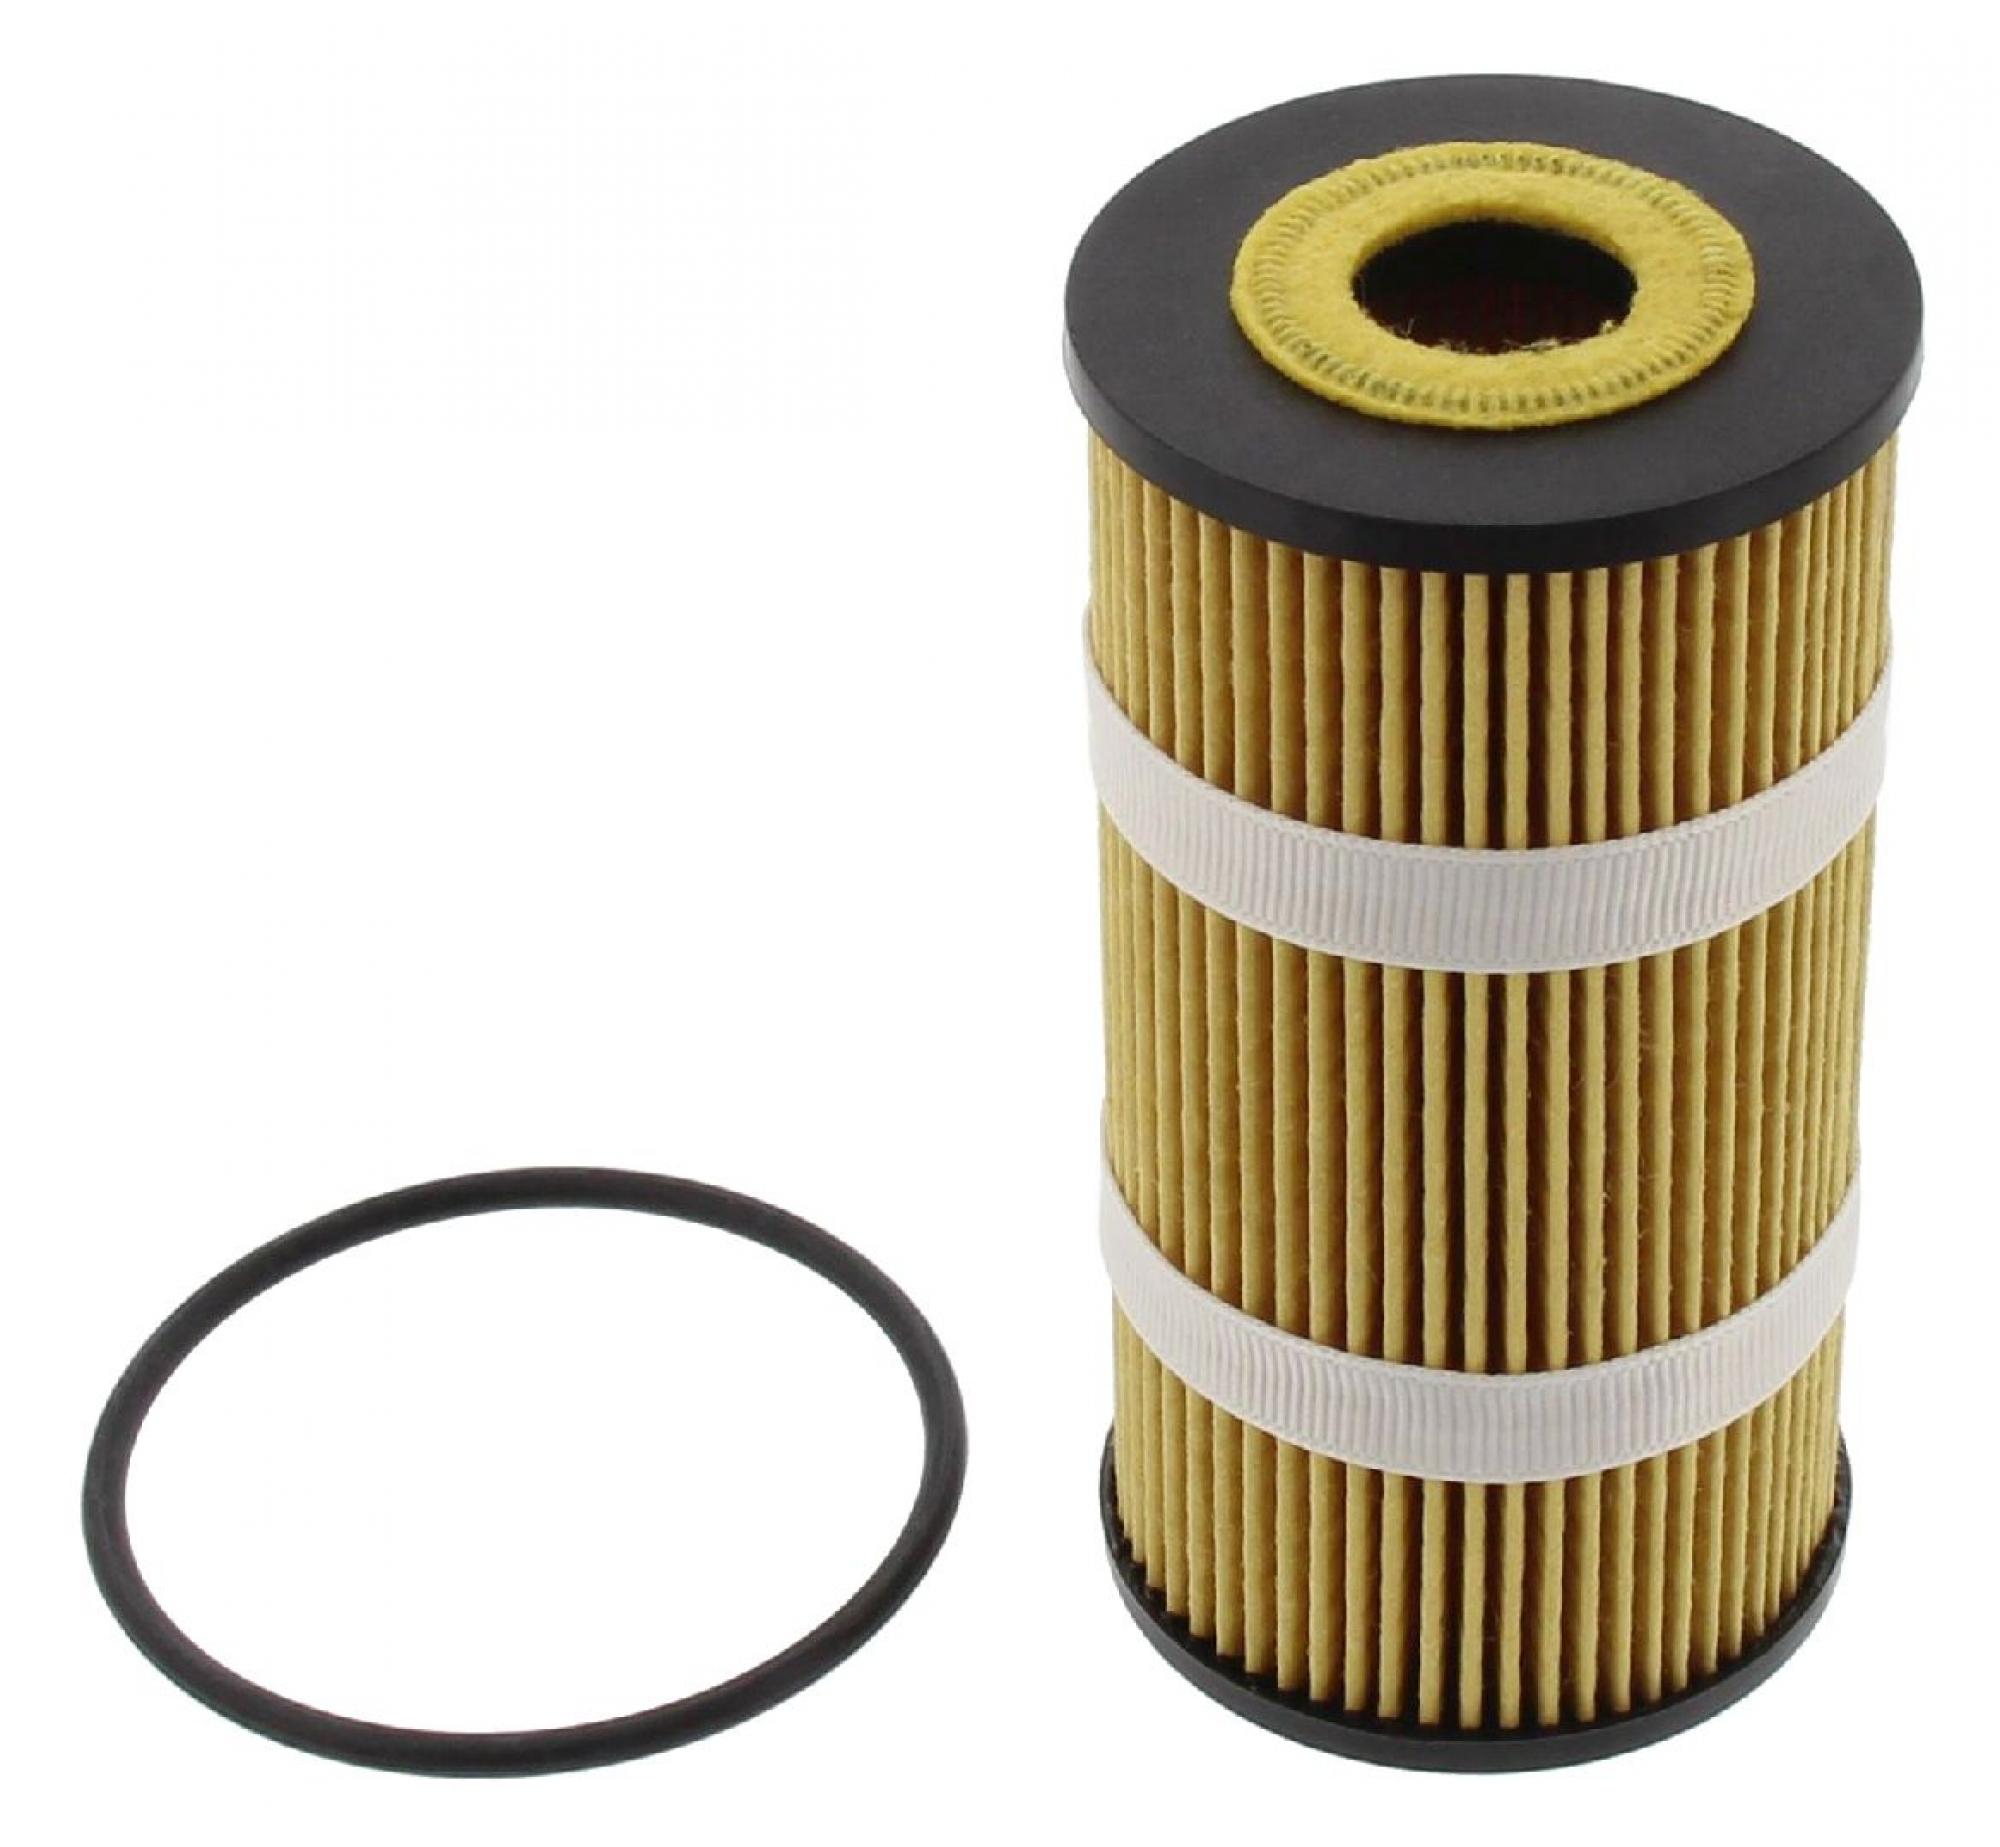 MAPCO 61704 Oil Filter